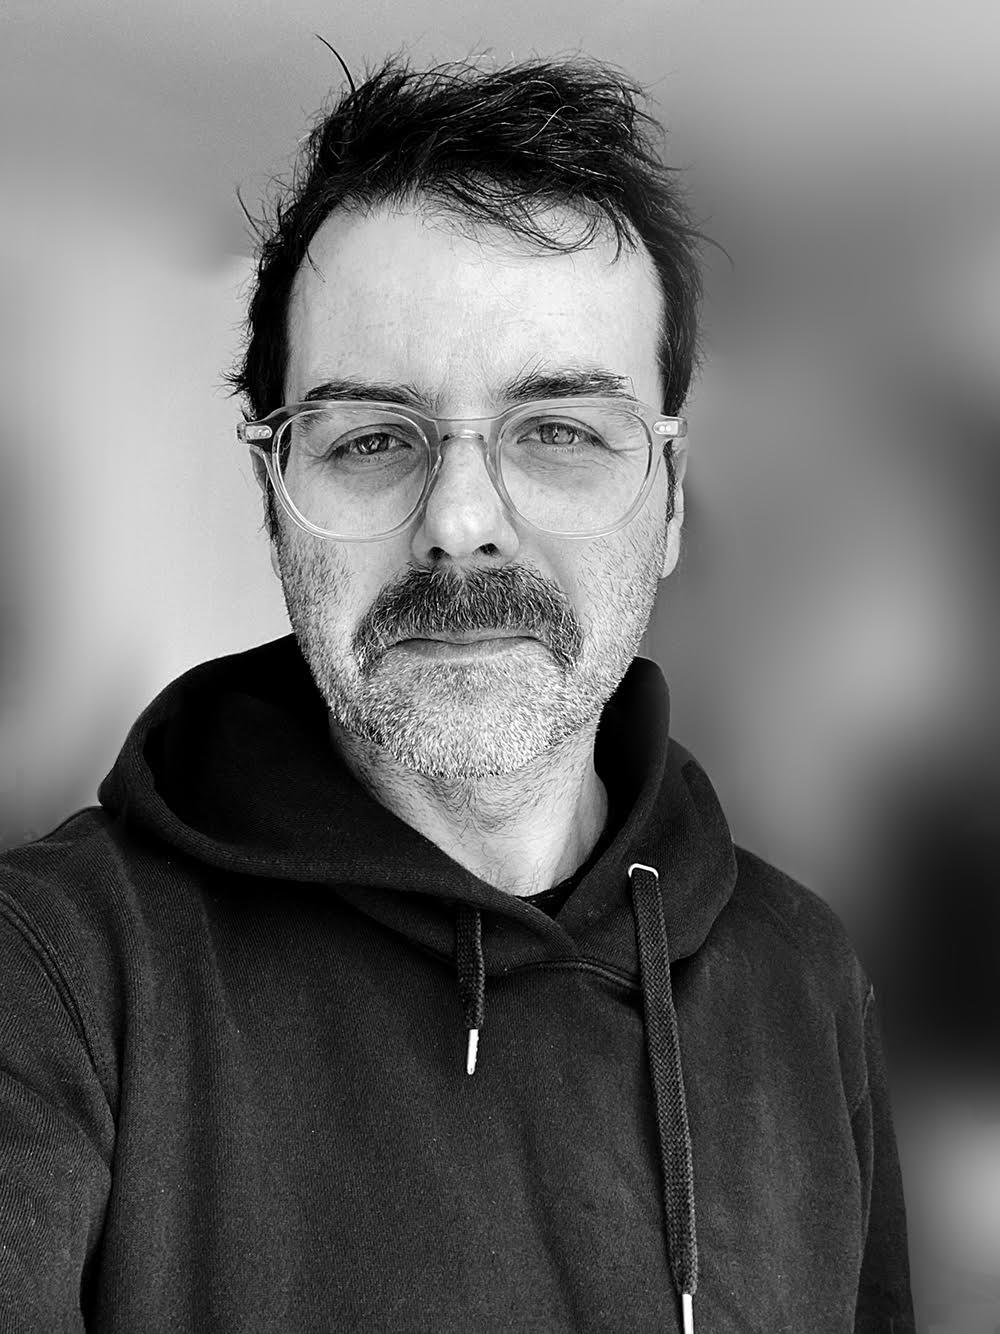 Collective member profile image